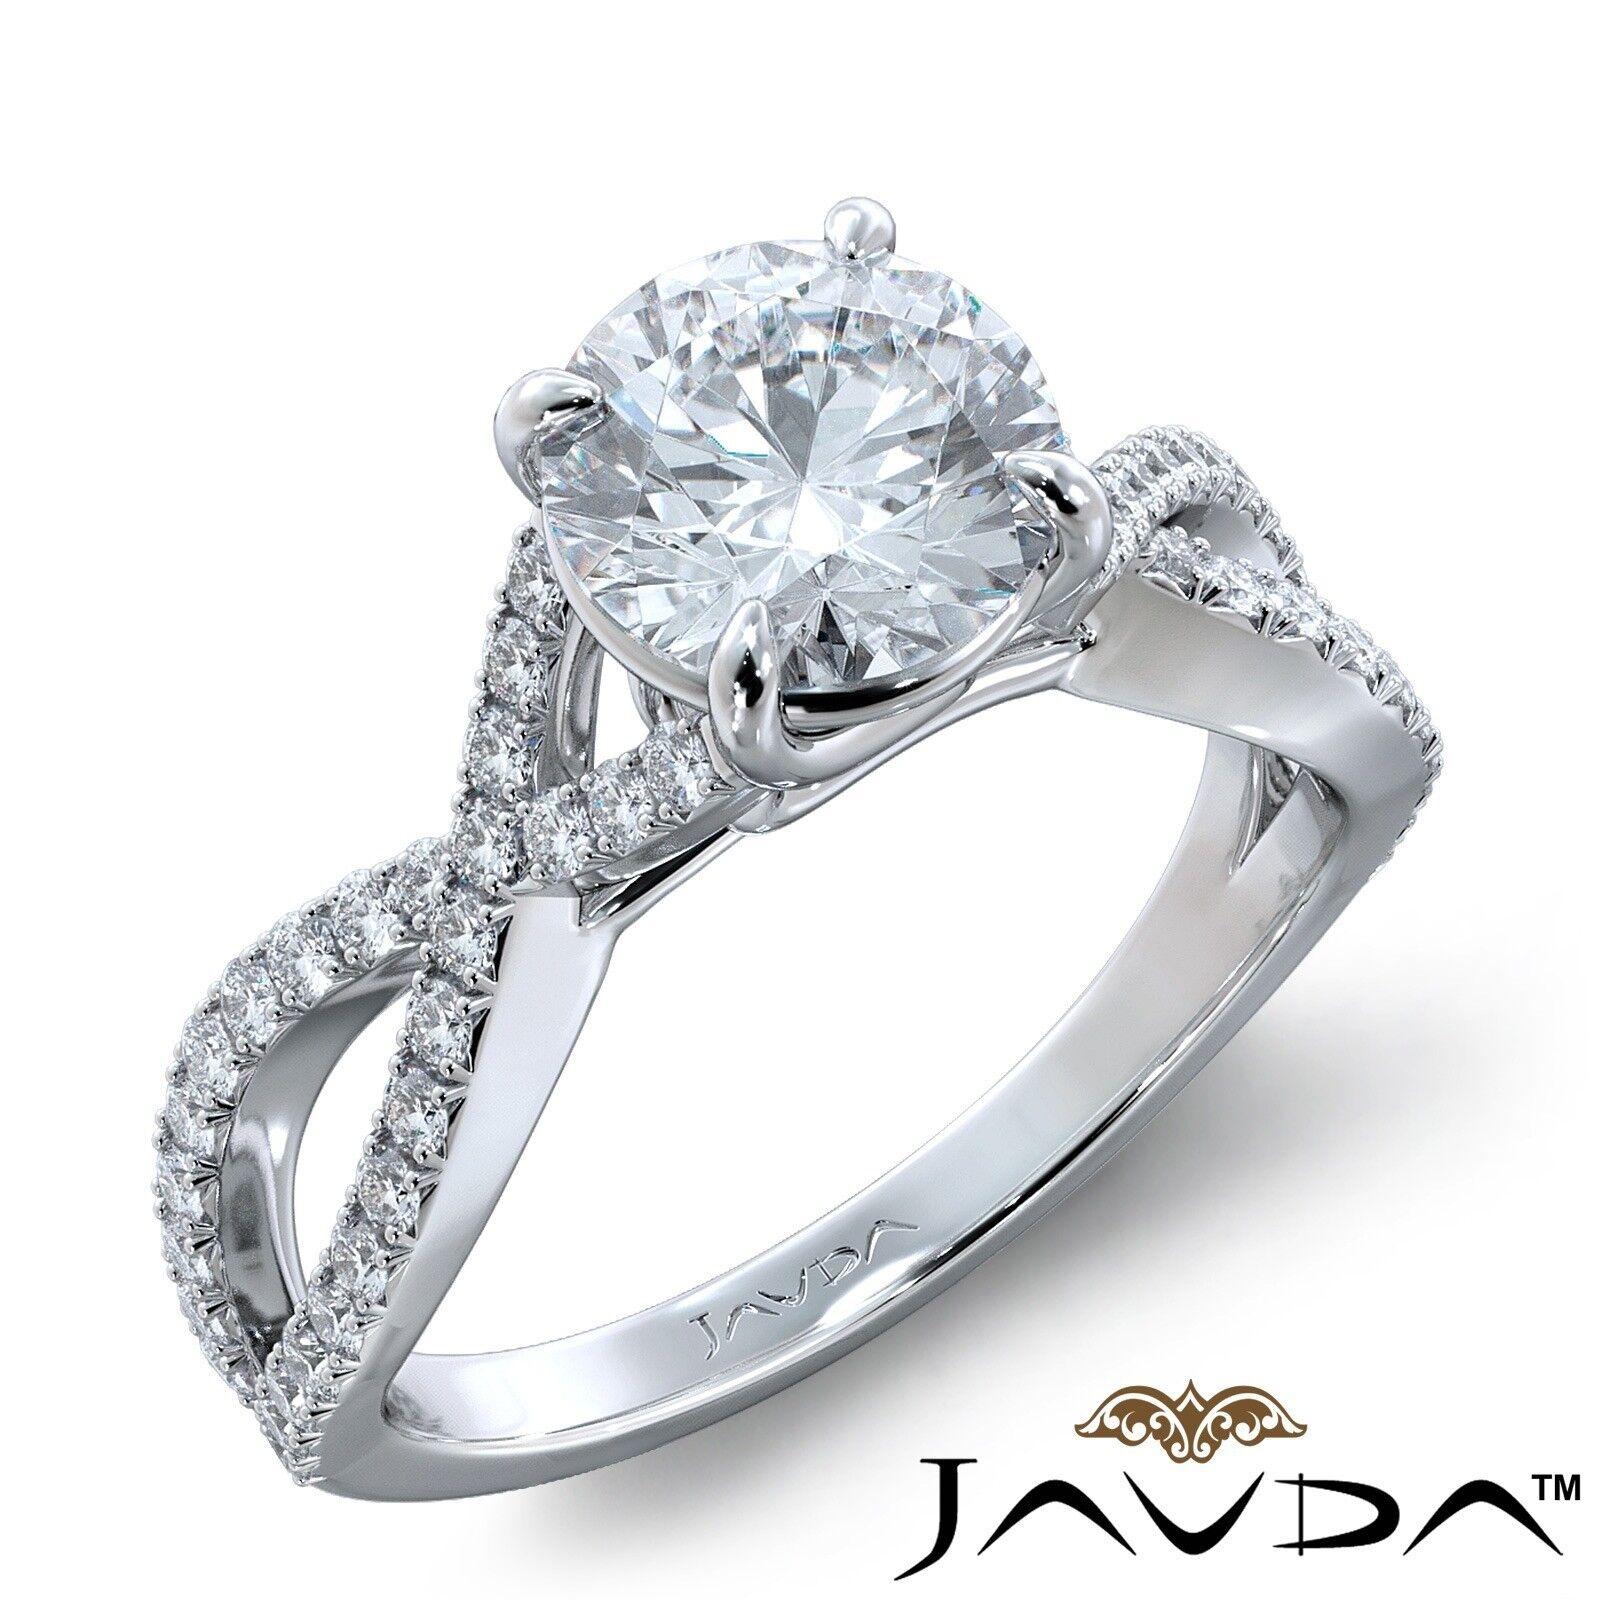 1.64ctw French Pave Sidestone Round Diamond Engagement Ring GIA E-VS1 White Gold